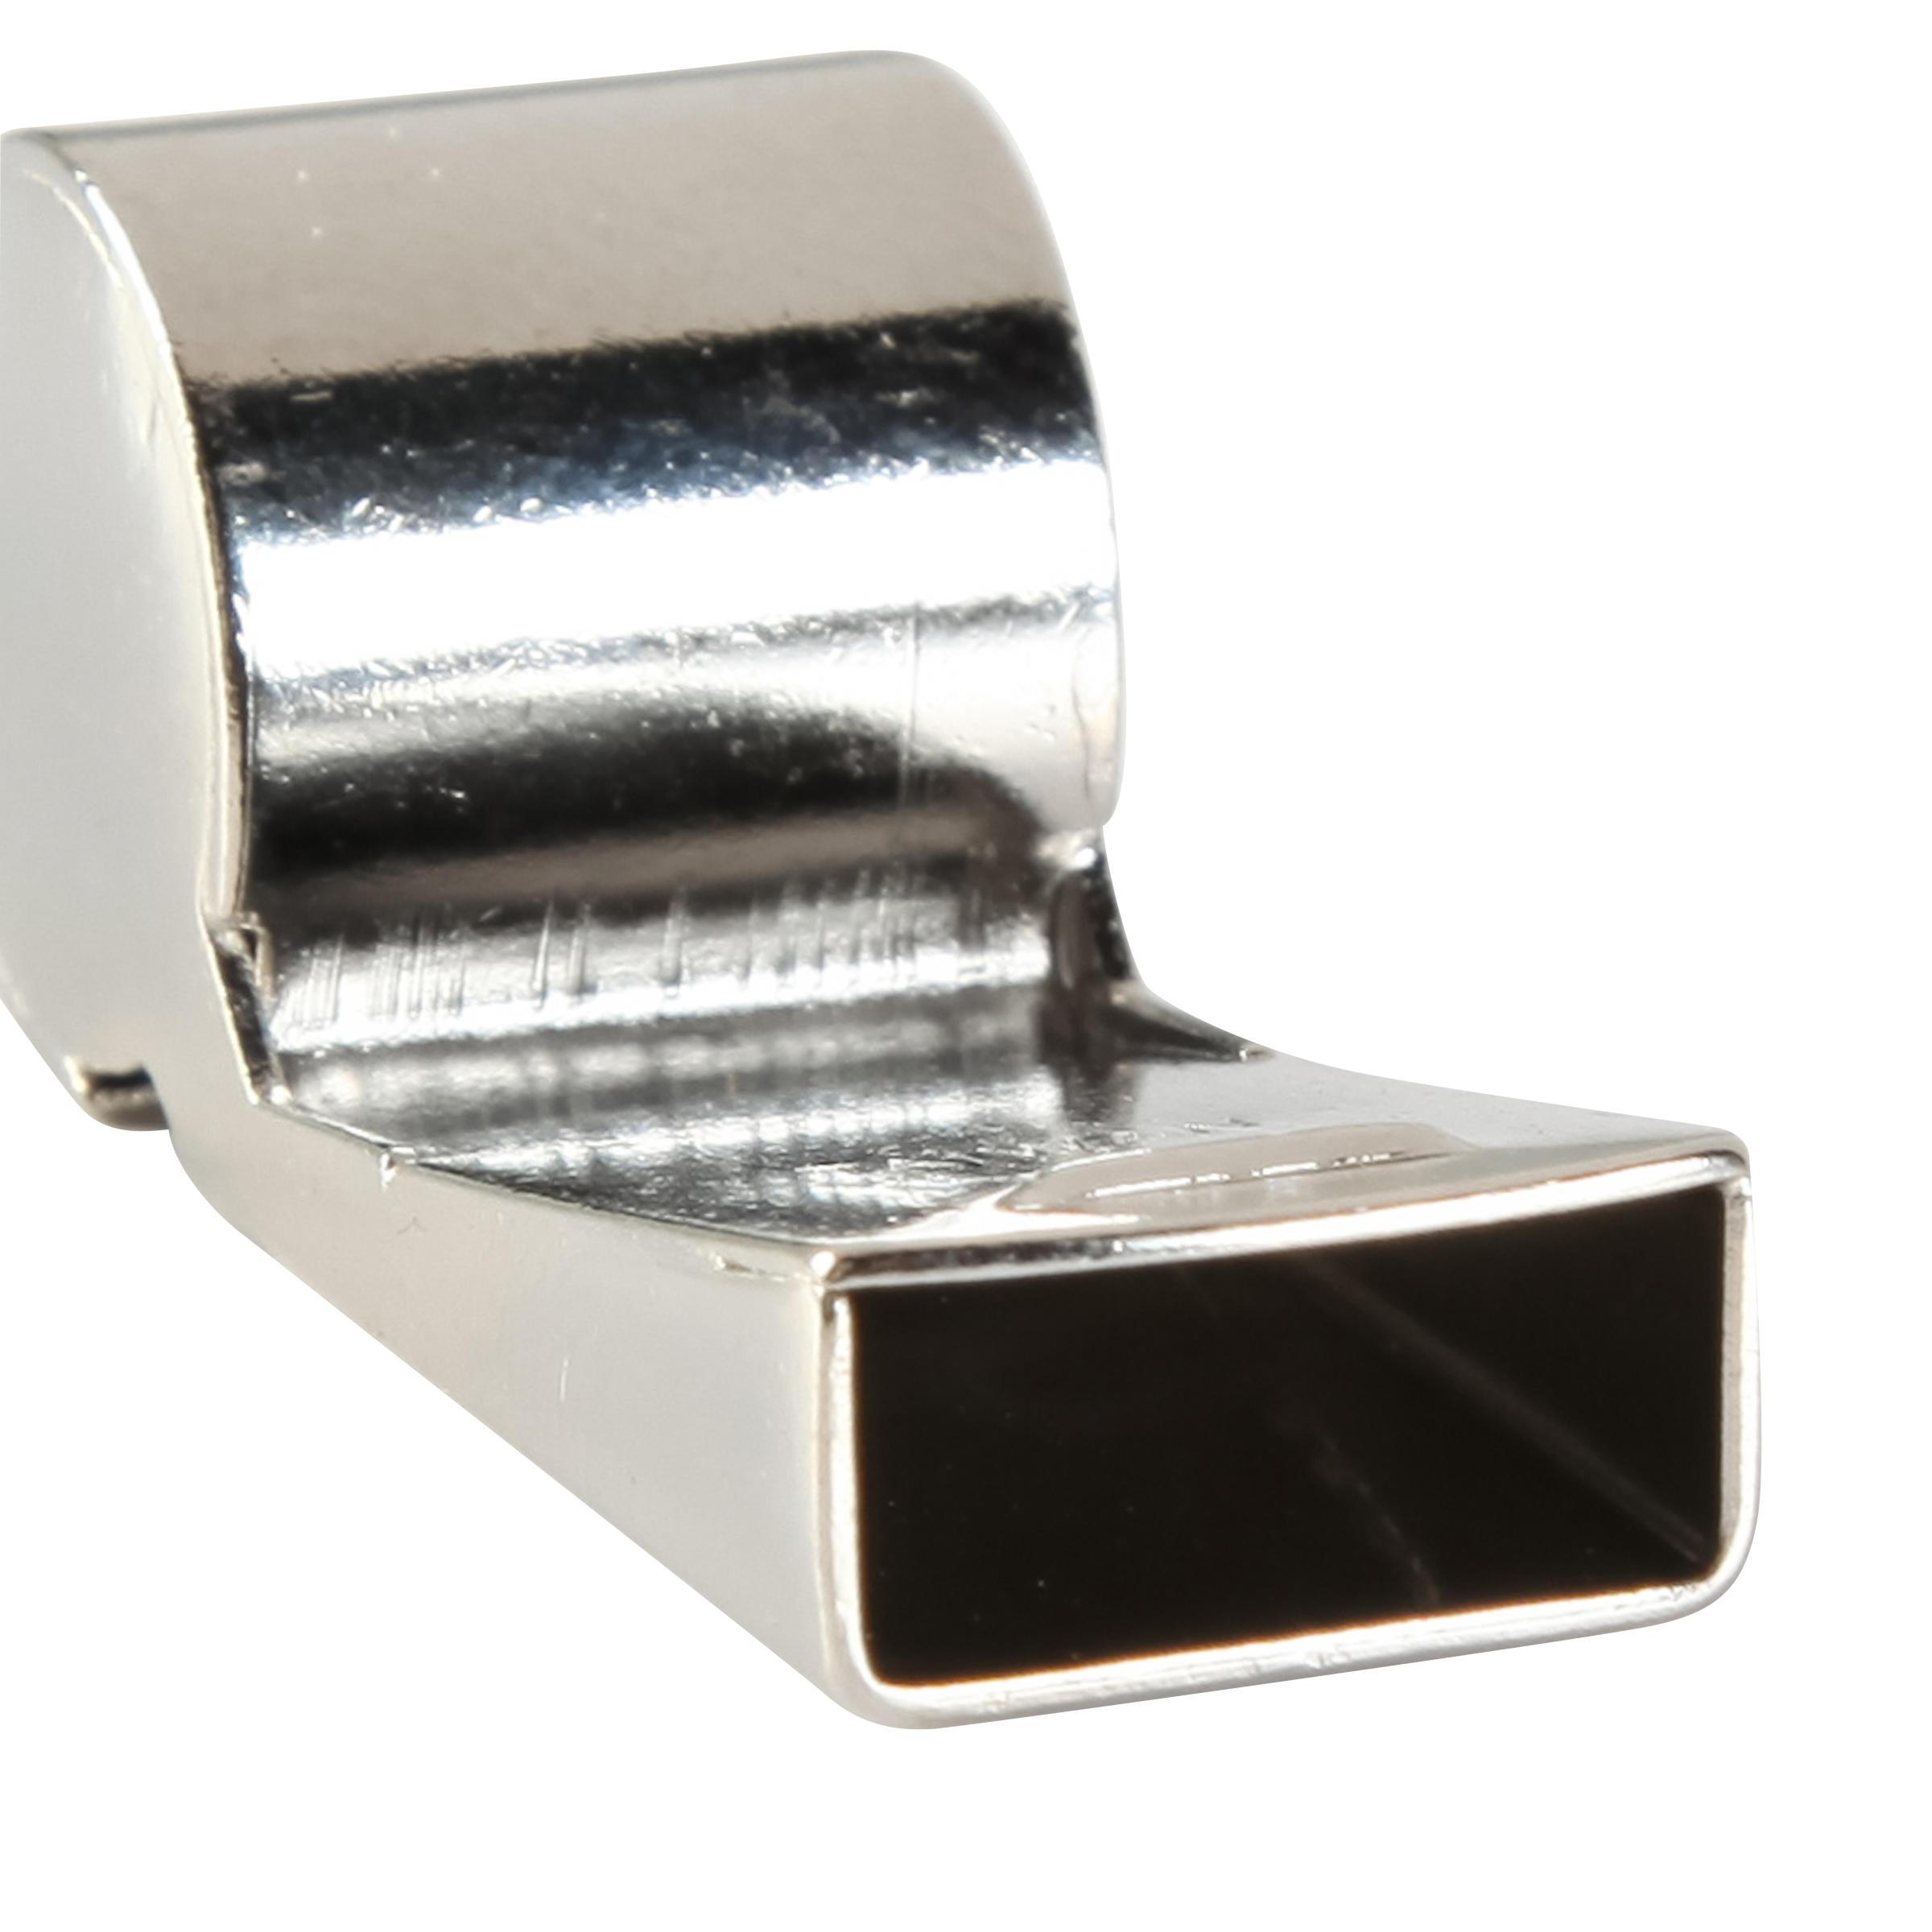 Metal Whistle - Light Grey